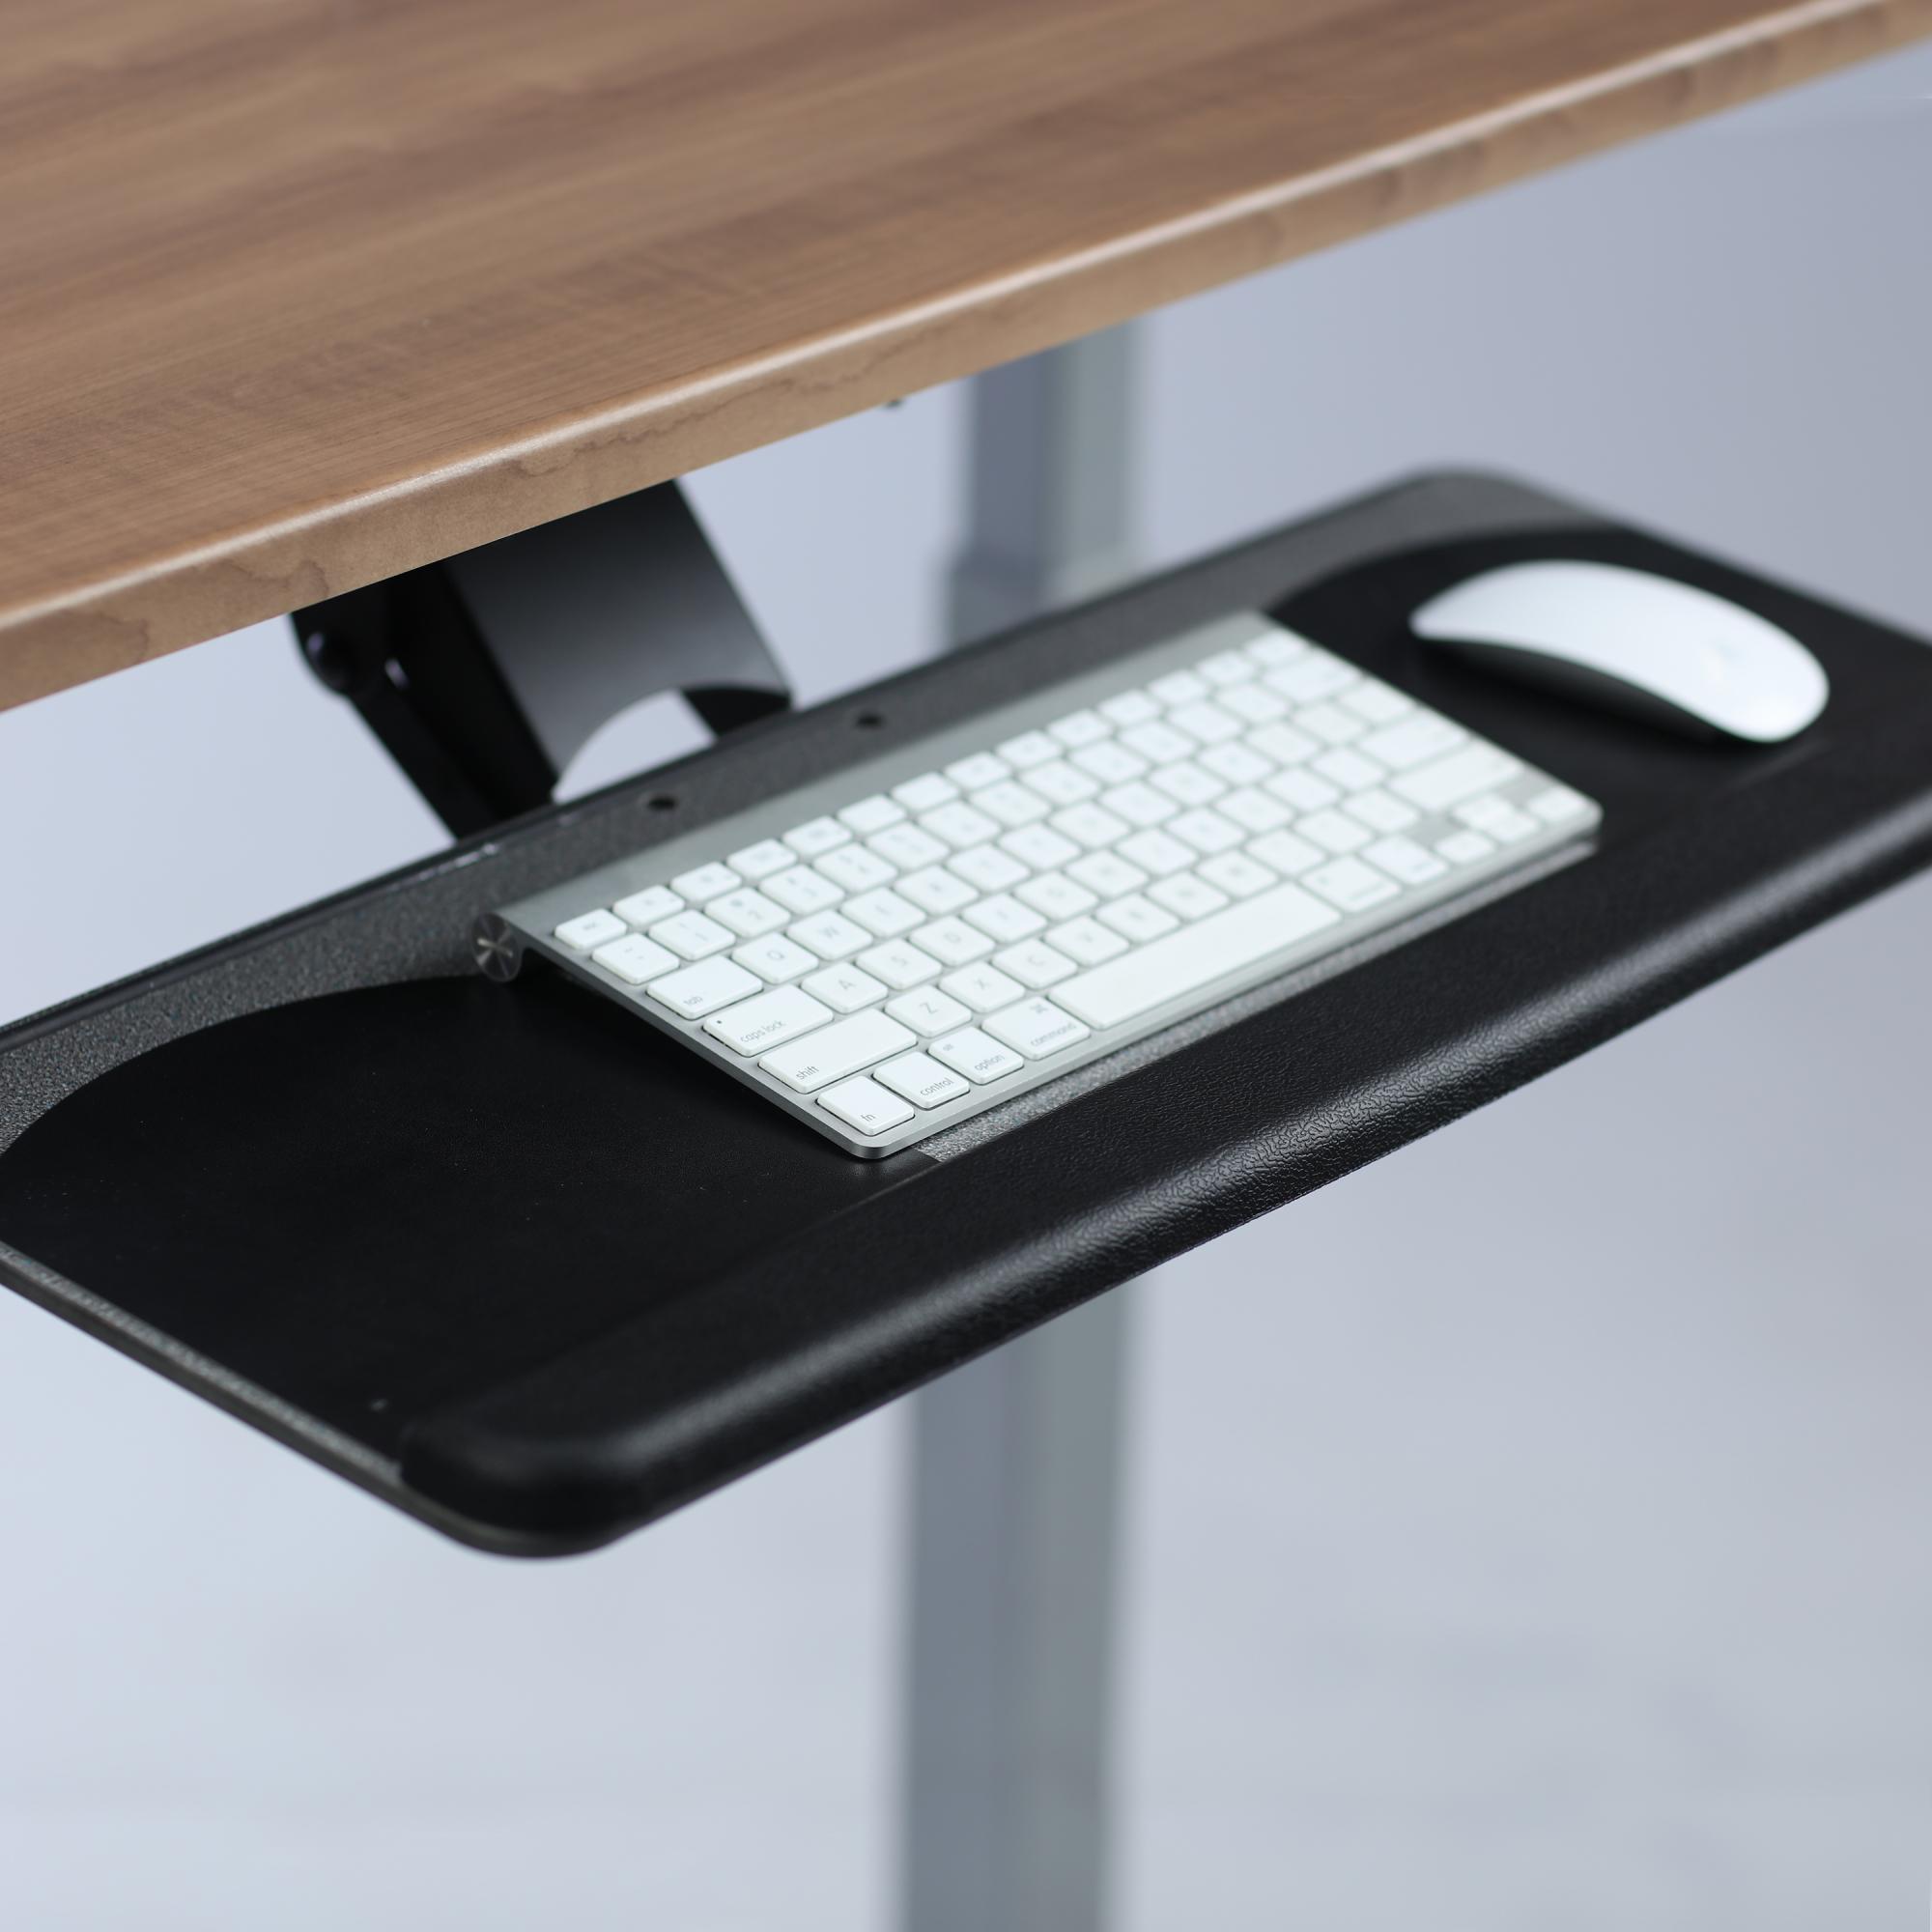 SmartMoves Adjustable Keyboard Tray